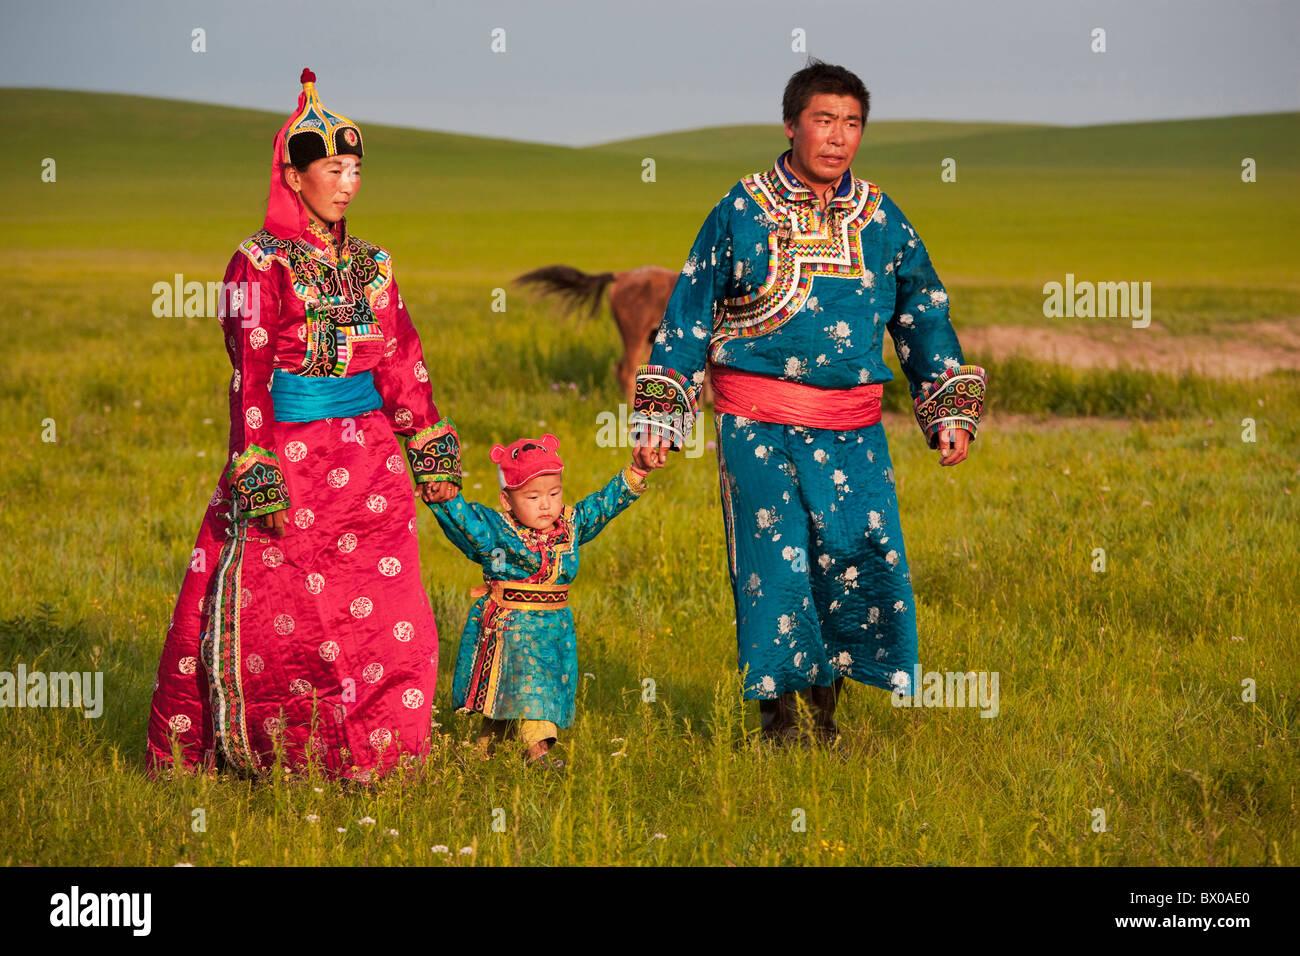 Mongolian couple with child, Xilin Gol Grassland, Xilinhot, Inner Mongolia Autonomous Region, China - Stock Image